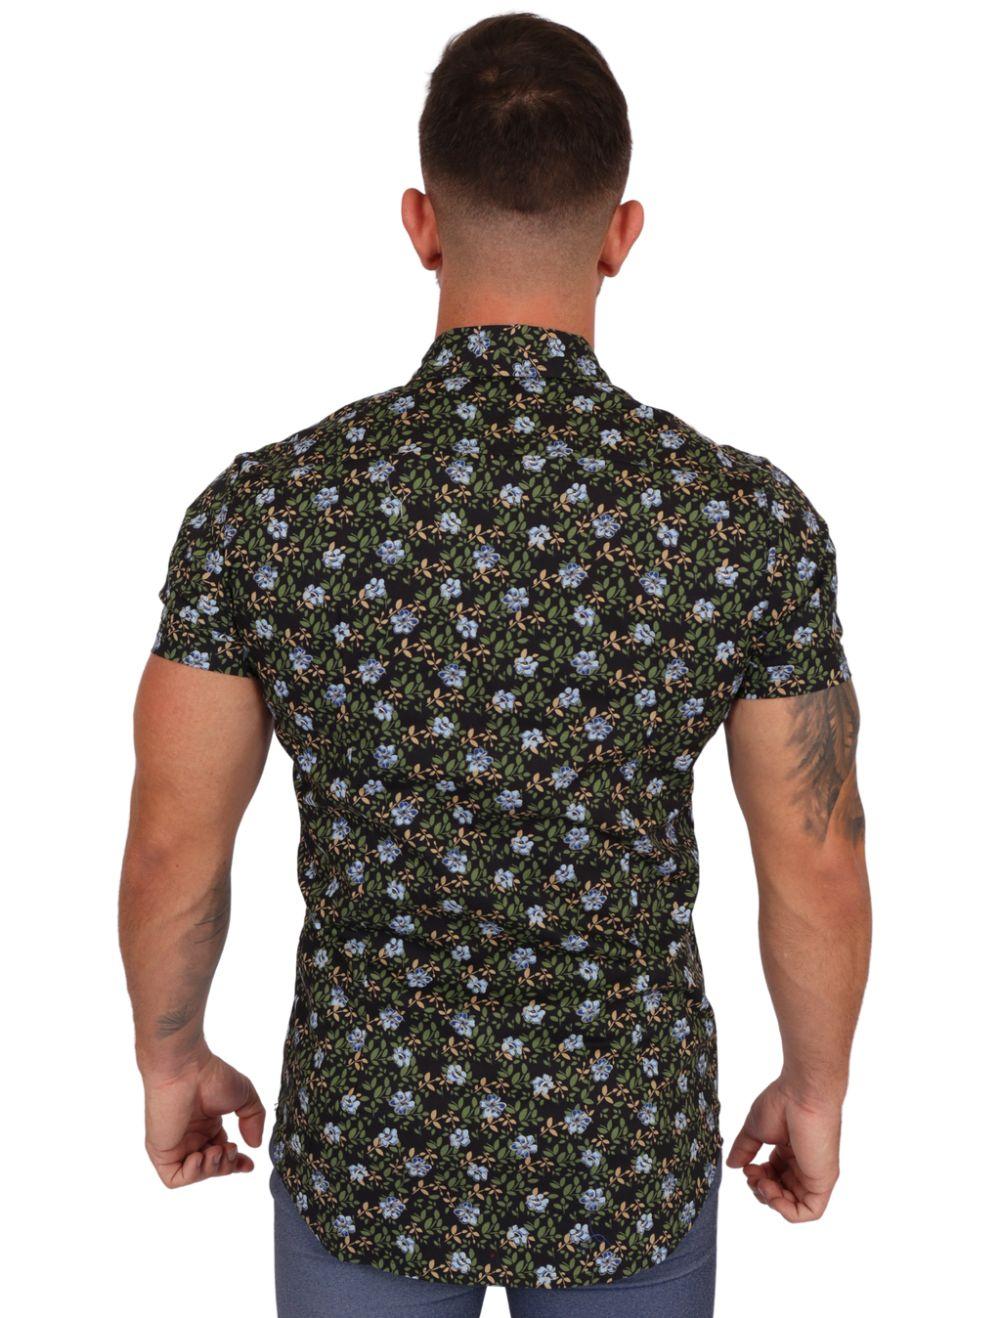 Camisa Masculina Manga Curta Floral Preto